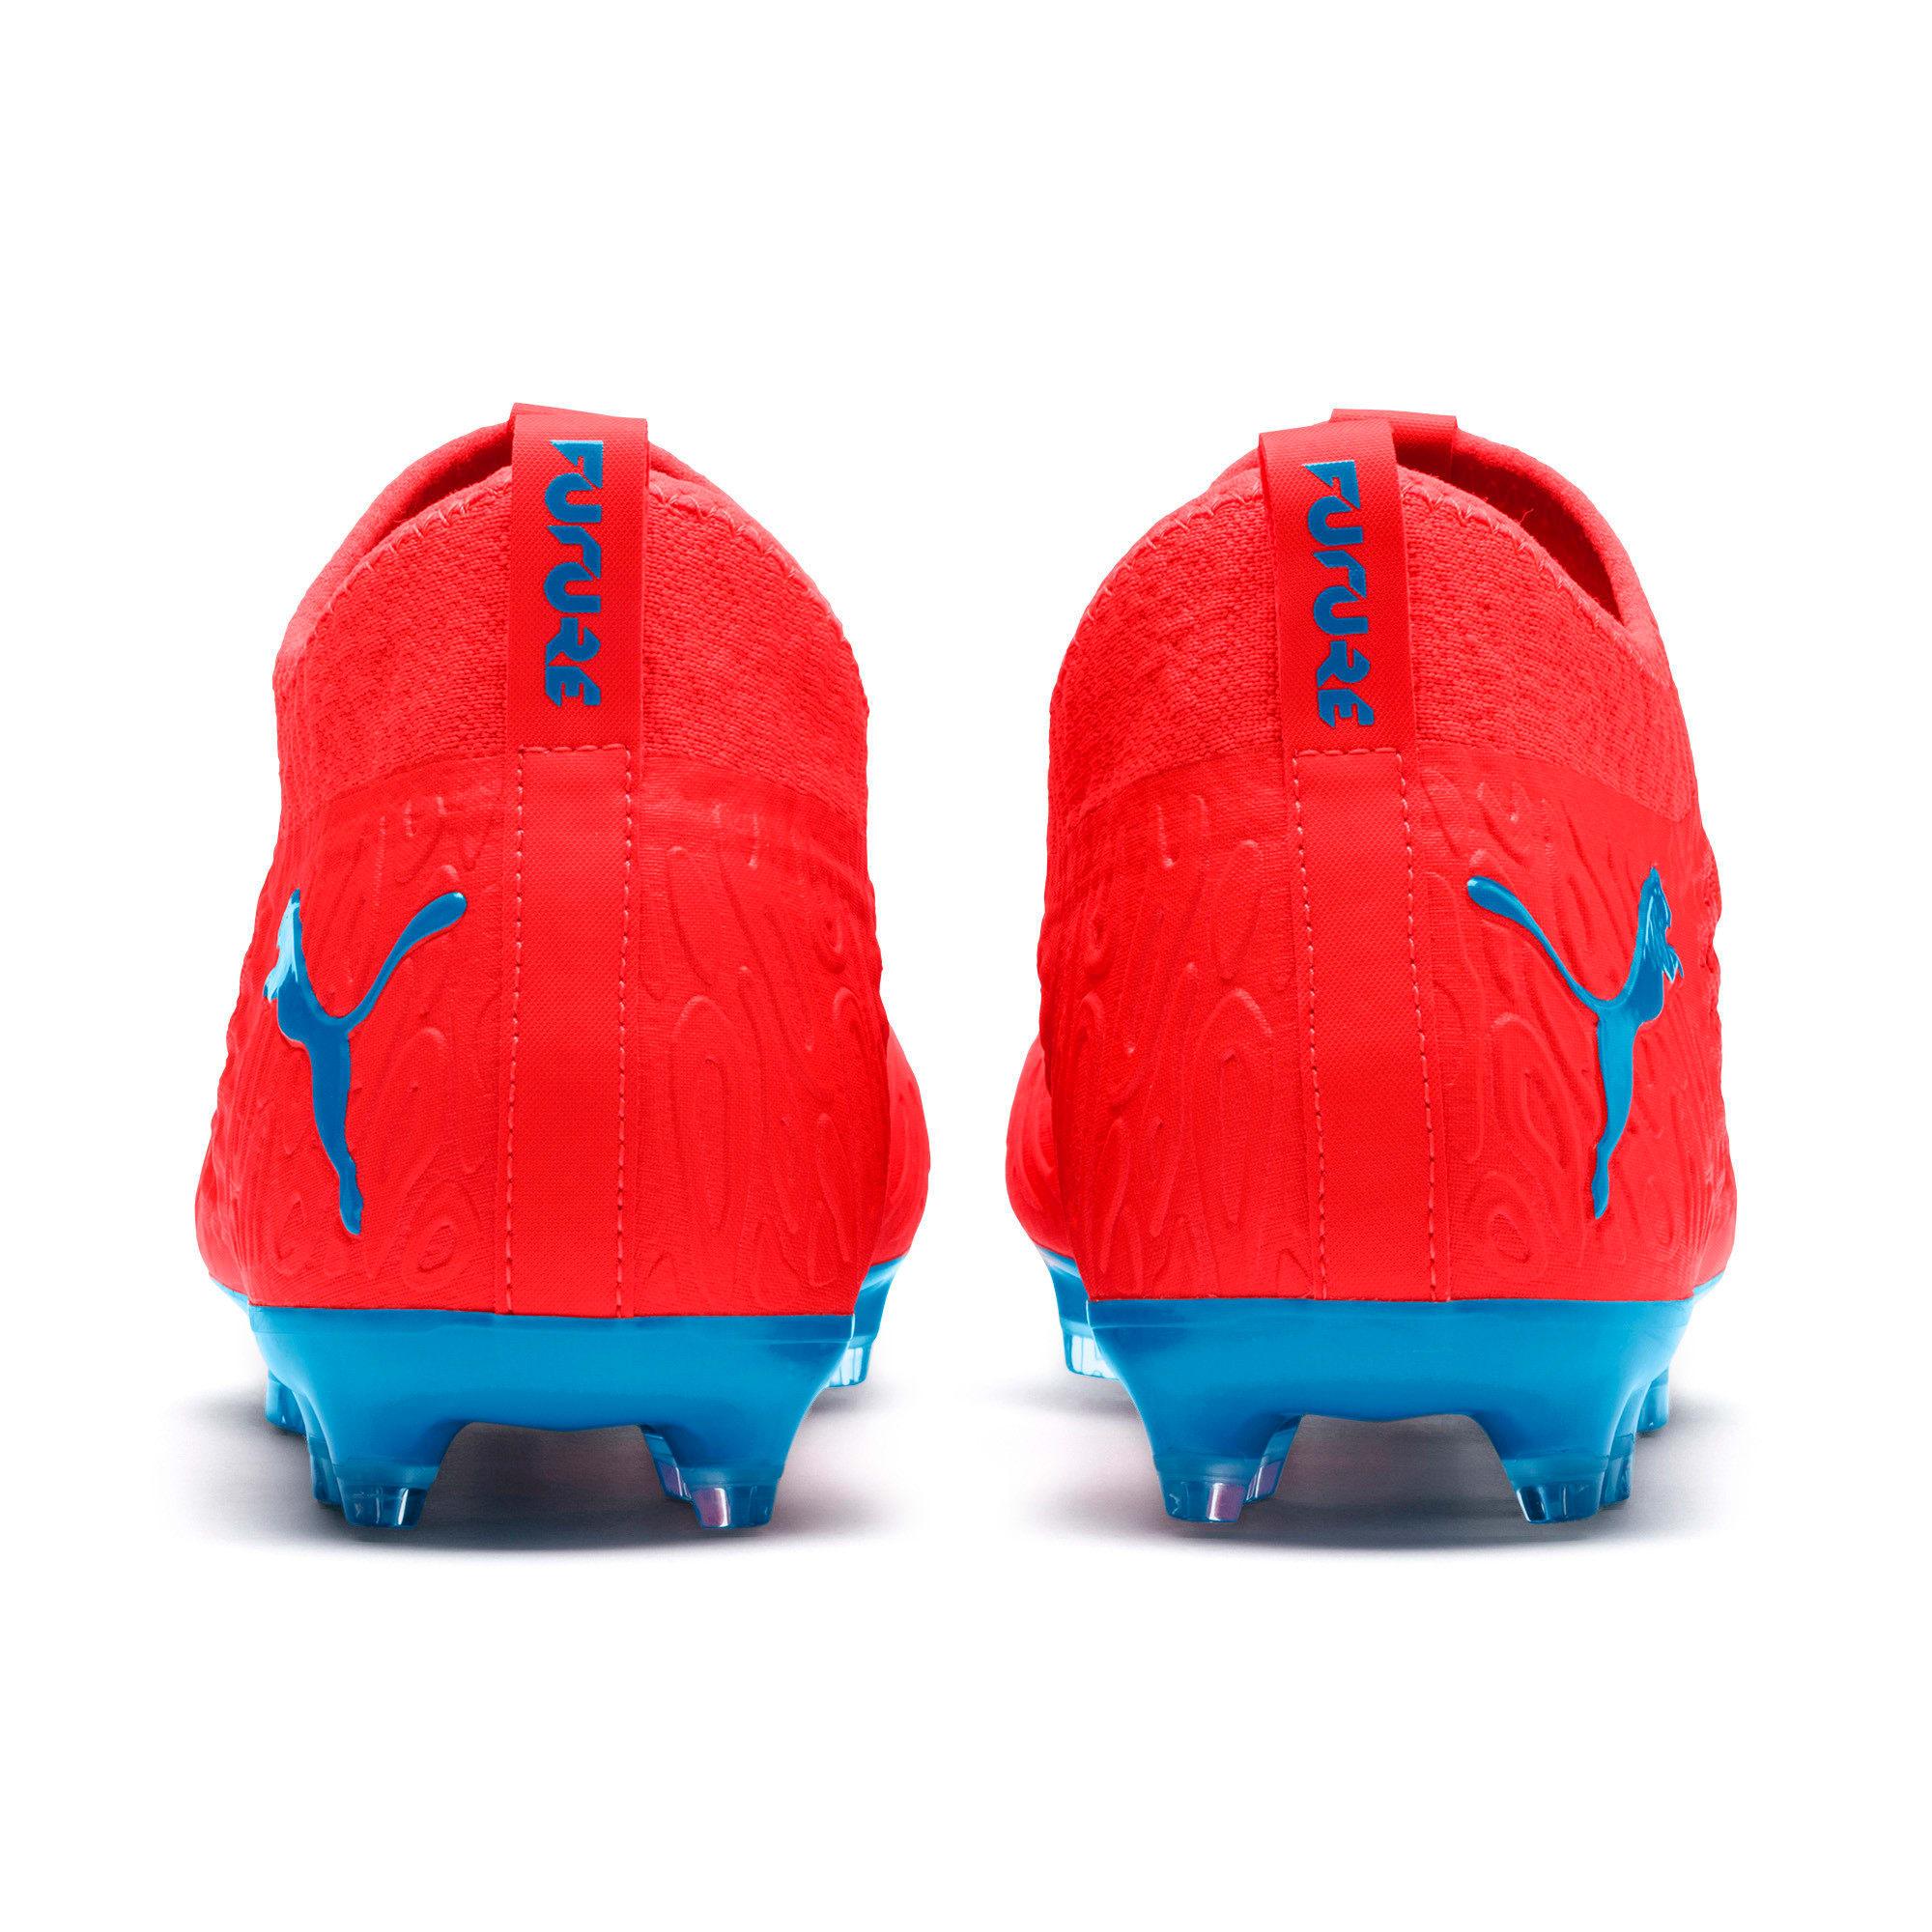 Thumbnail 3 of FUTURE 19.3 NETFIT FG/AG Men's Football Boots, Red Blast-Bleu Azur, medium-IND